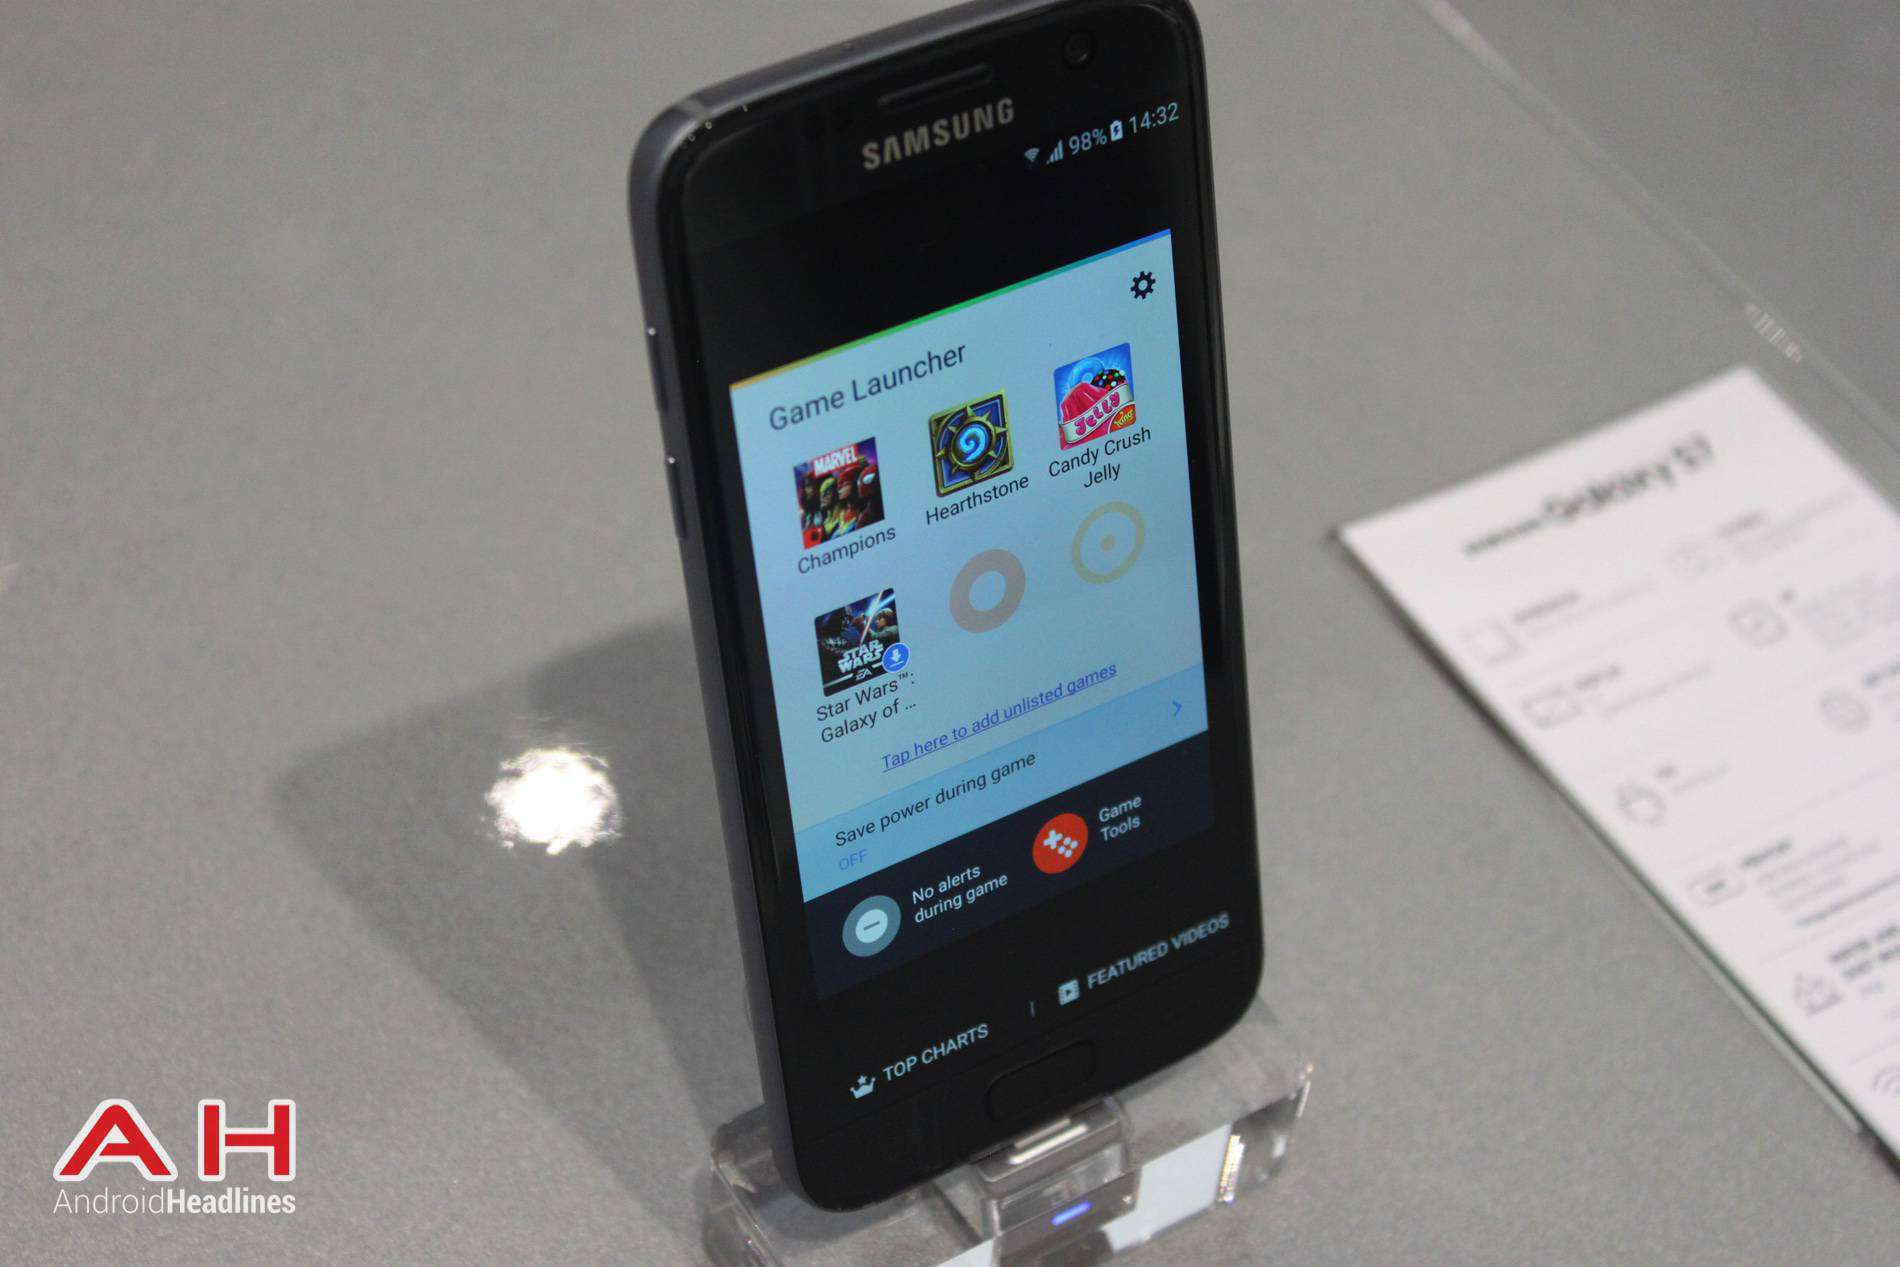 Galaxy S7 MWC Booth AH 4